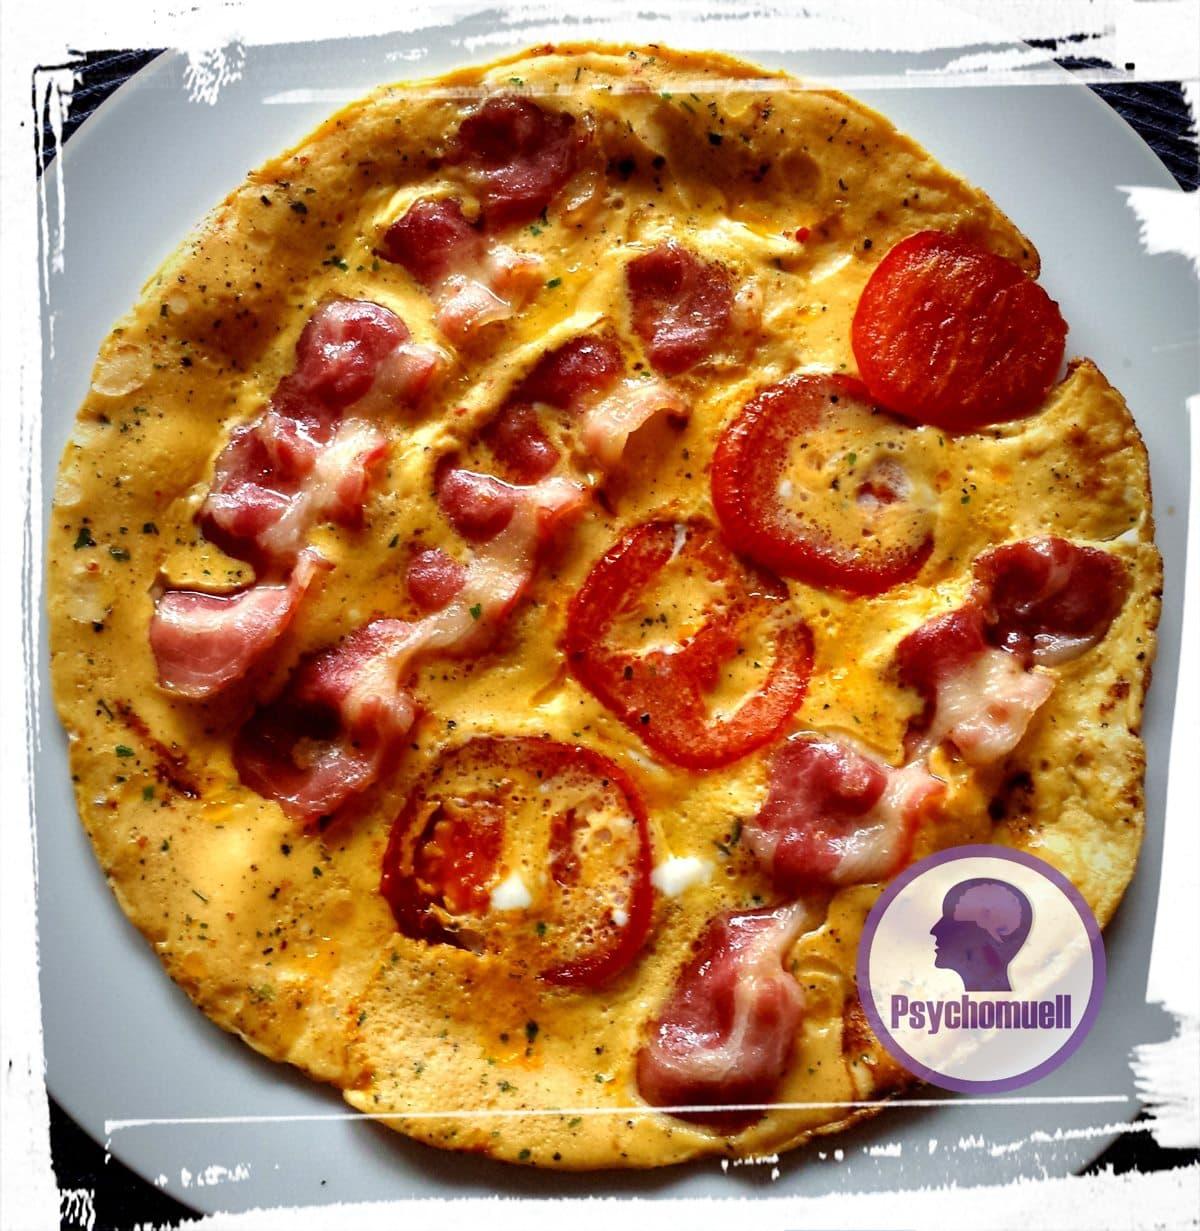 Frühstück: Omelette 🥚 mit Speck